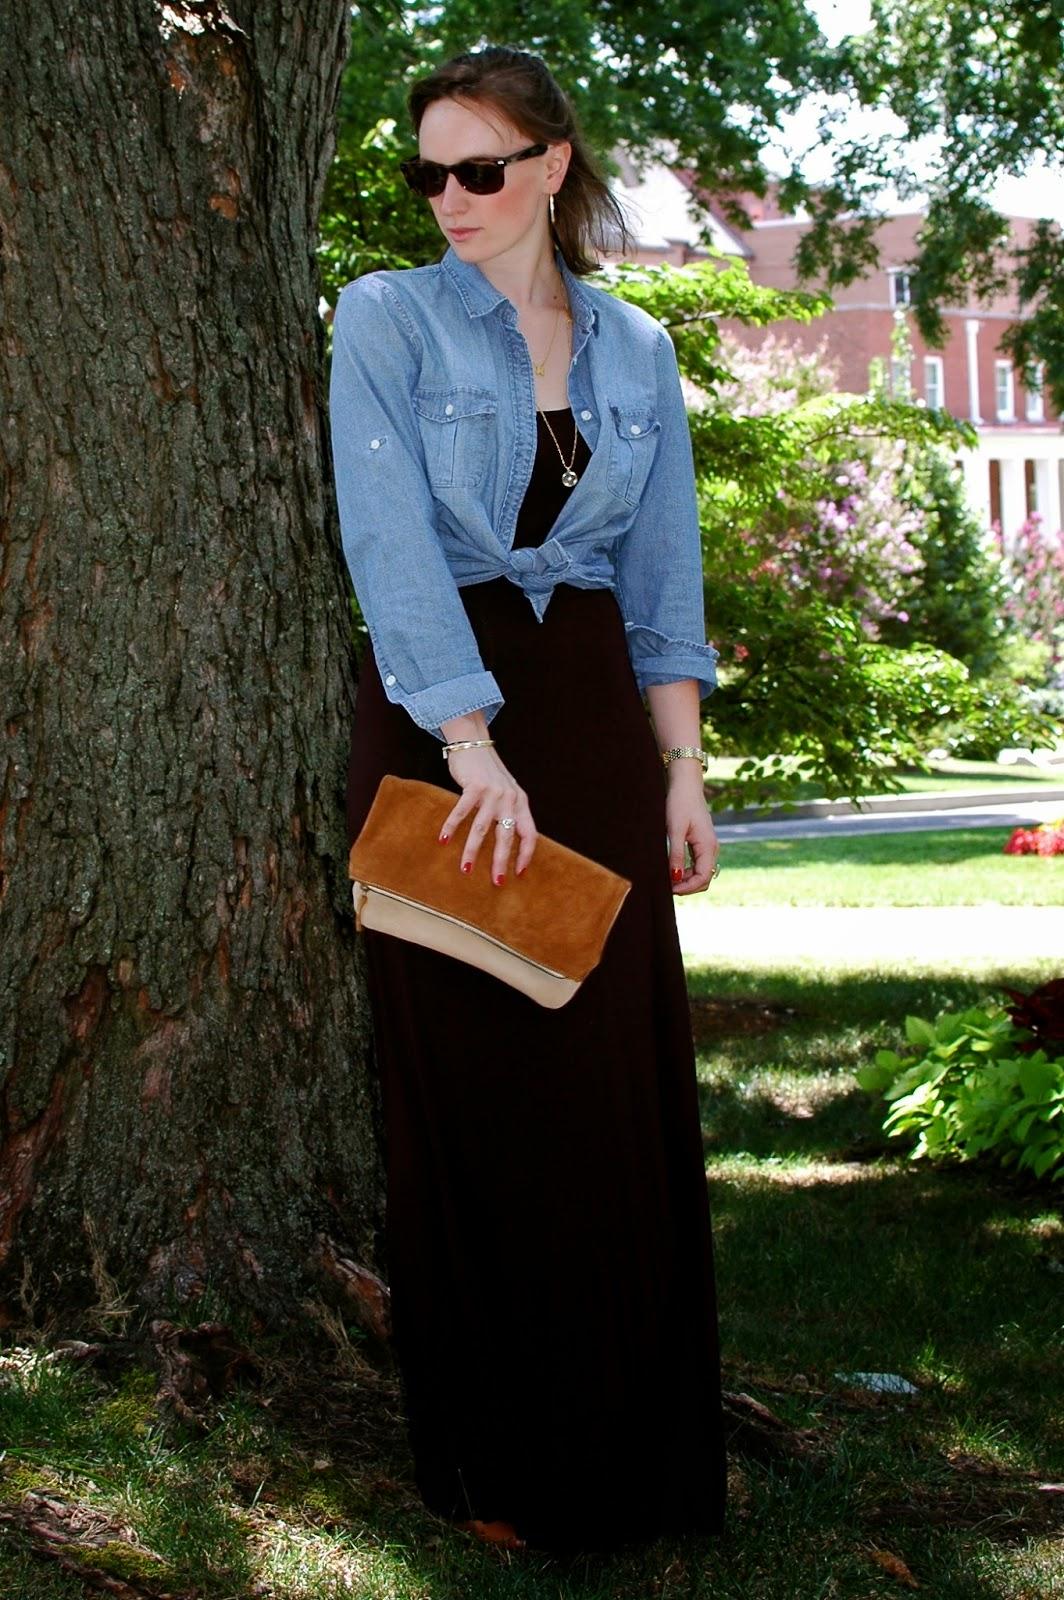 Black Maxi Dress, Wayfarers, Layered Necklaces, Christina Kober, Chambray Shirt, Nashville Style